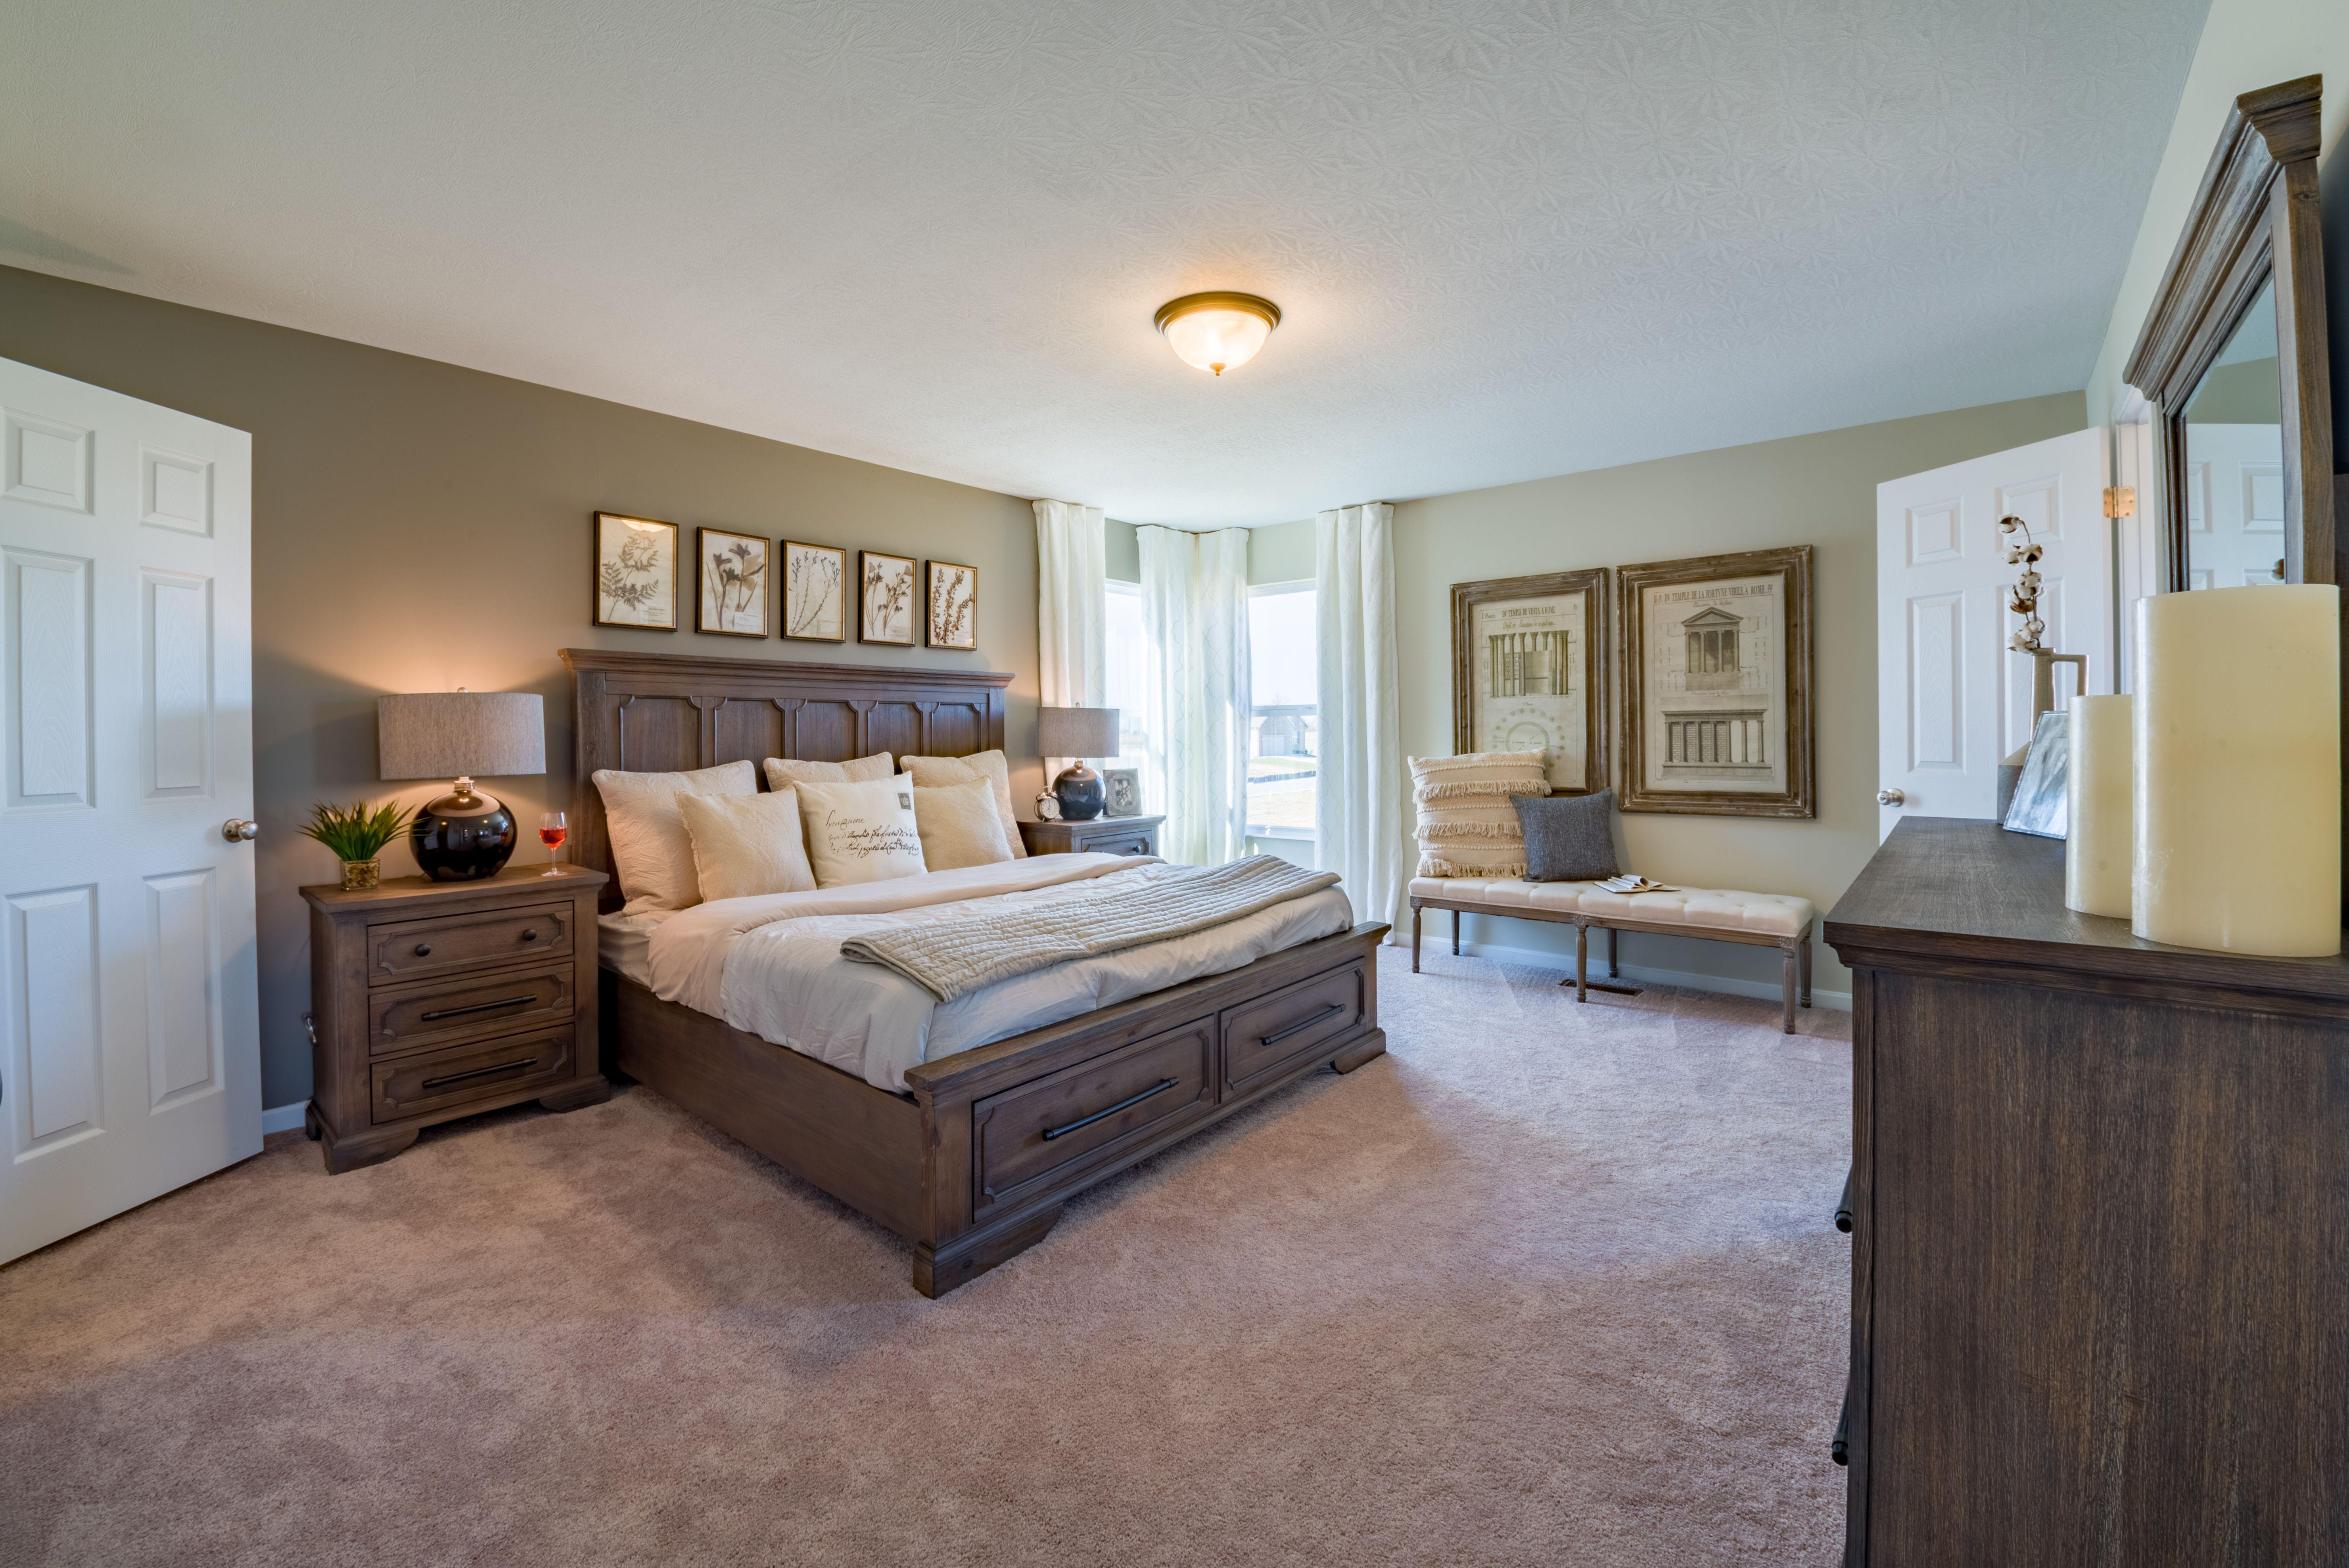 Bedroom featured in the Cumberland By Fischer Homes  in Cincinnati, OH